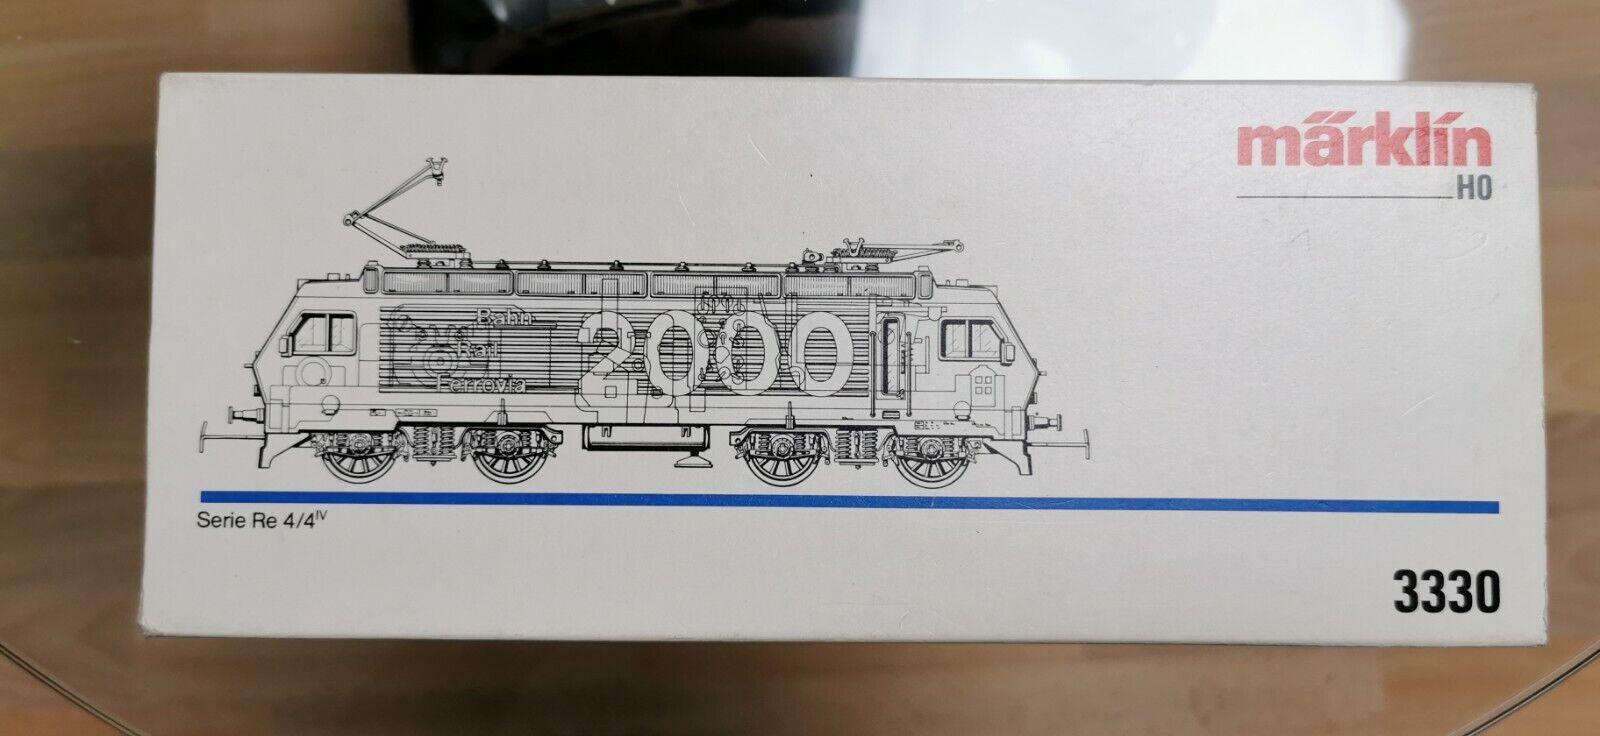 marklin HO 3330 serie re44 t2511